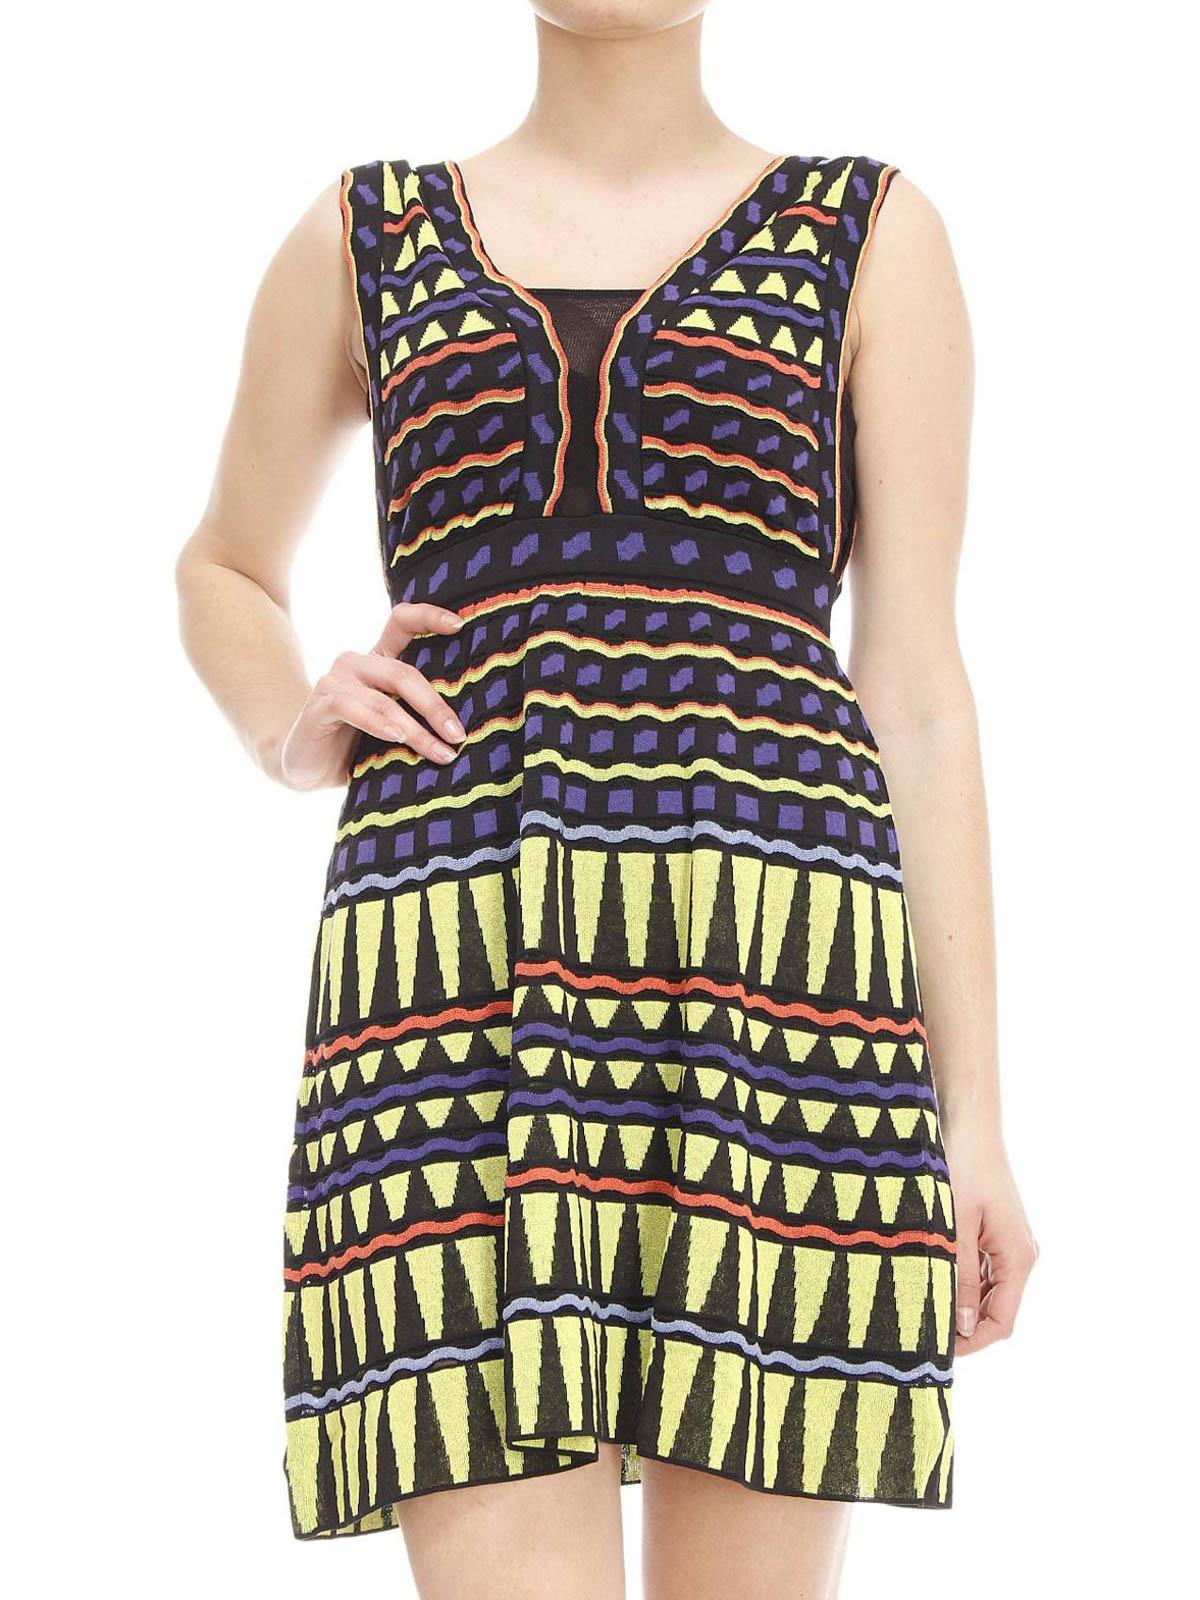 Shop our edit of women's designer Knitwear from luxury designer brands at distrib-wjmx2fn9.ga